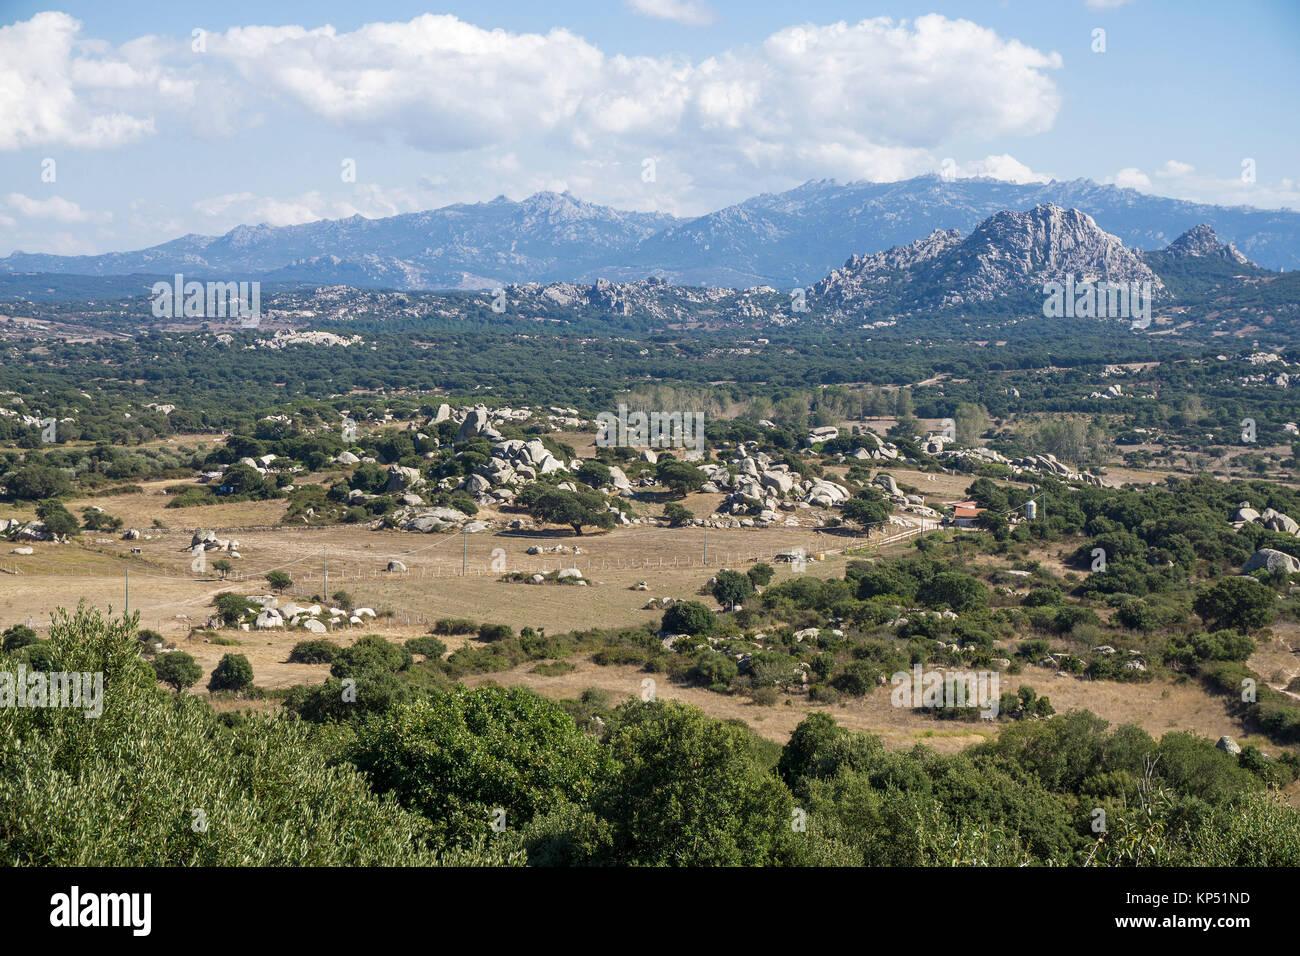 Valle della Luna, das Tal des Mondes, Granit Landschaft bei Aggius, Olbia-Tempio, Gallura, Sardinien, Italien, Mittelmeer, Stockbild